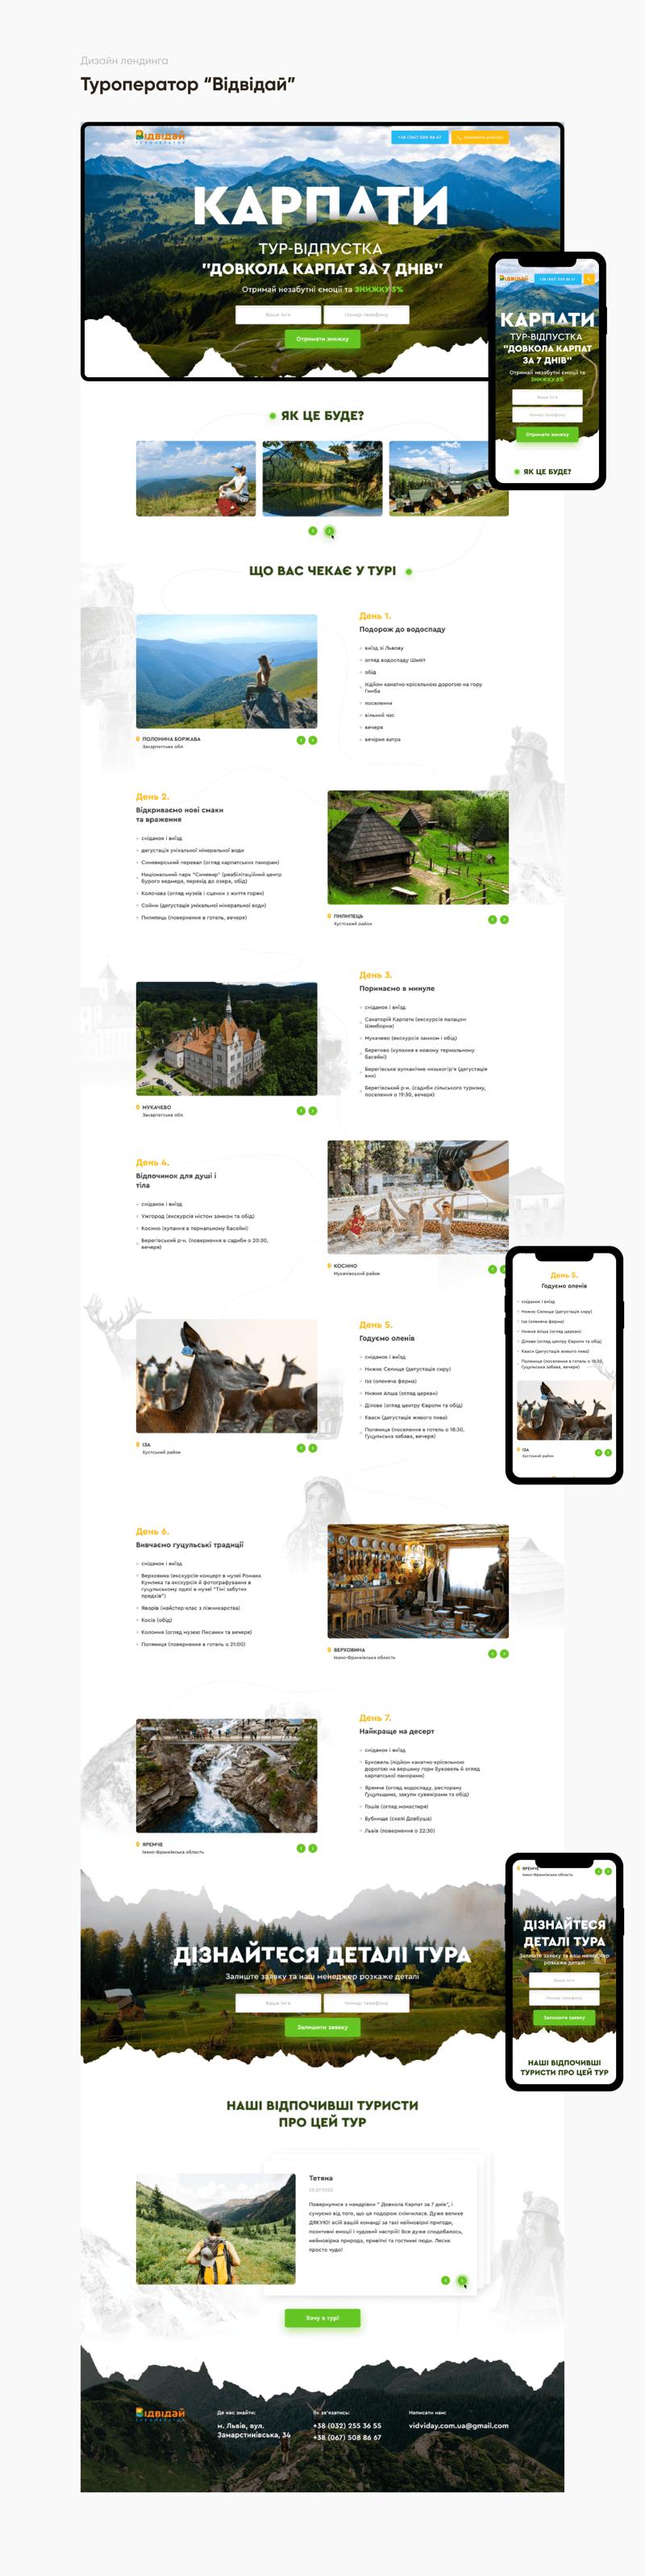 Дизайн лендинга для туроператора – work in freelancer's portfolio